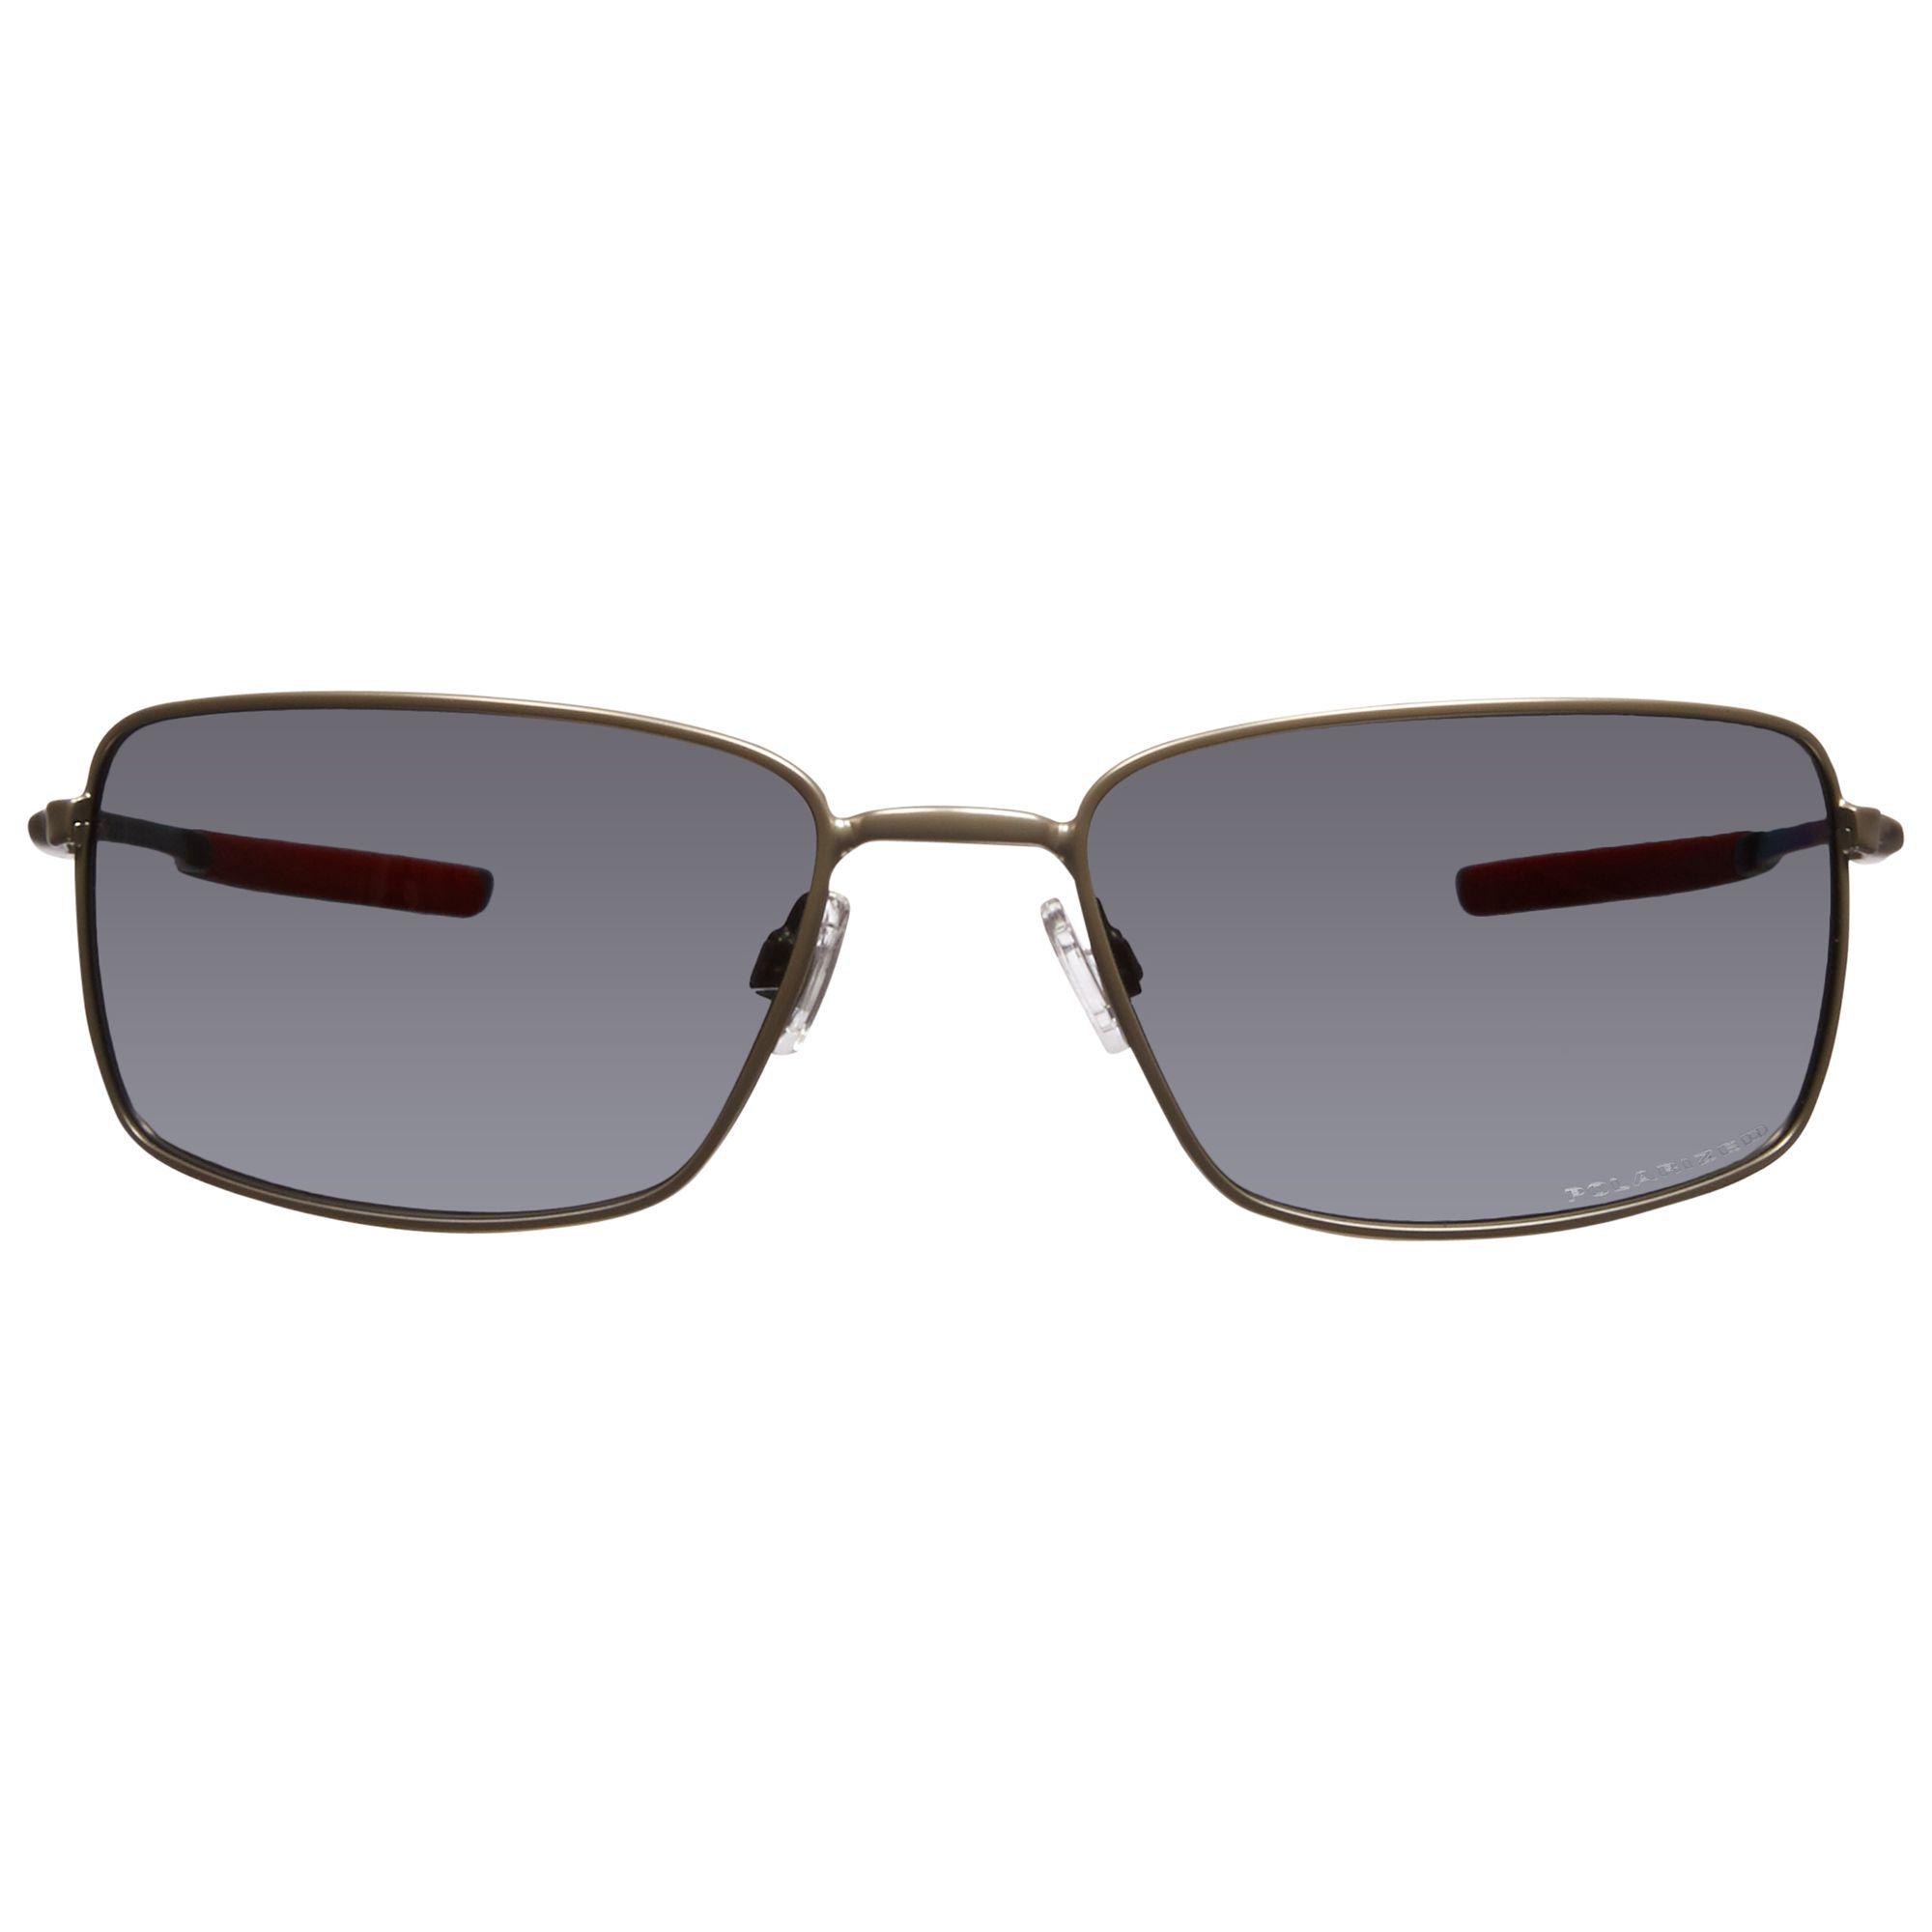 Oakley Metal Frame Glasses : Buy Oakley 004075 Plaintiff Squared Metal Frame Polarised ...